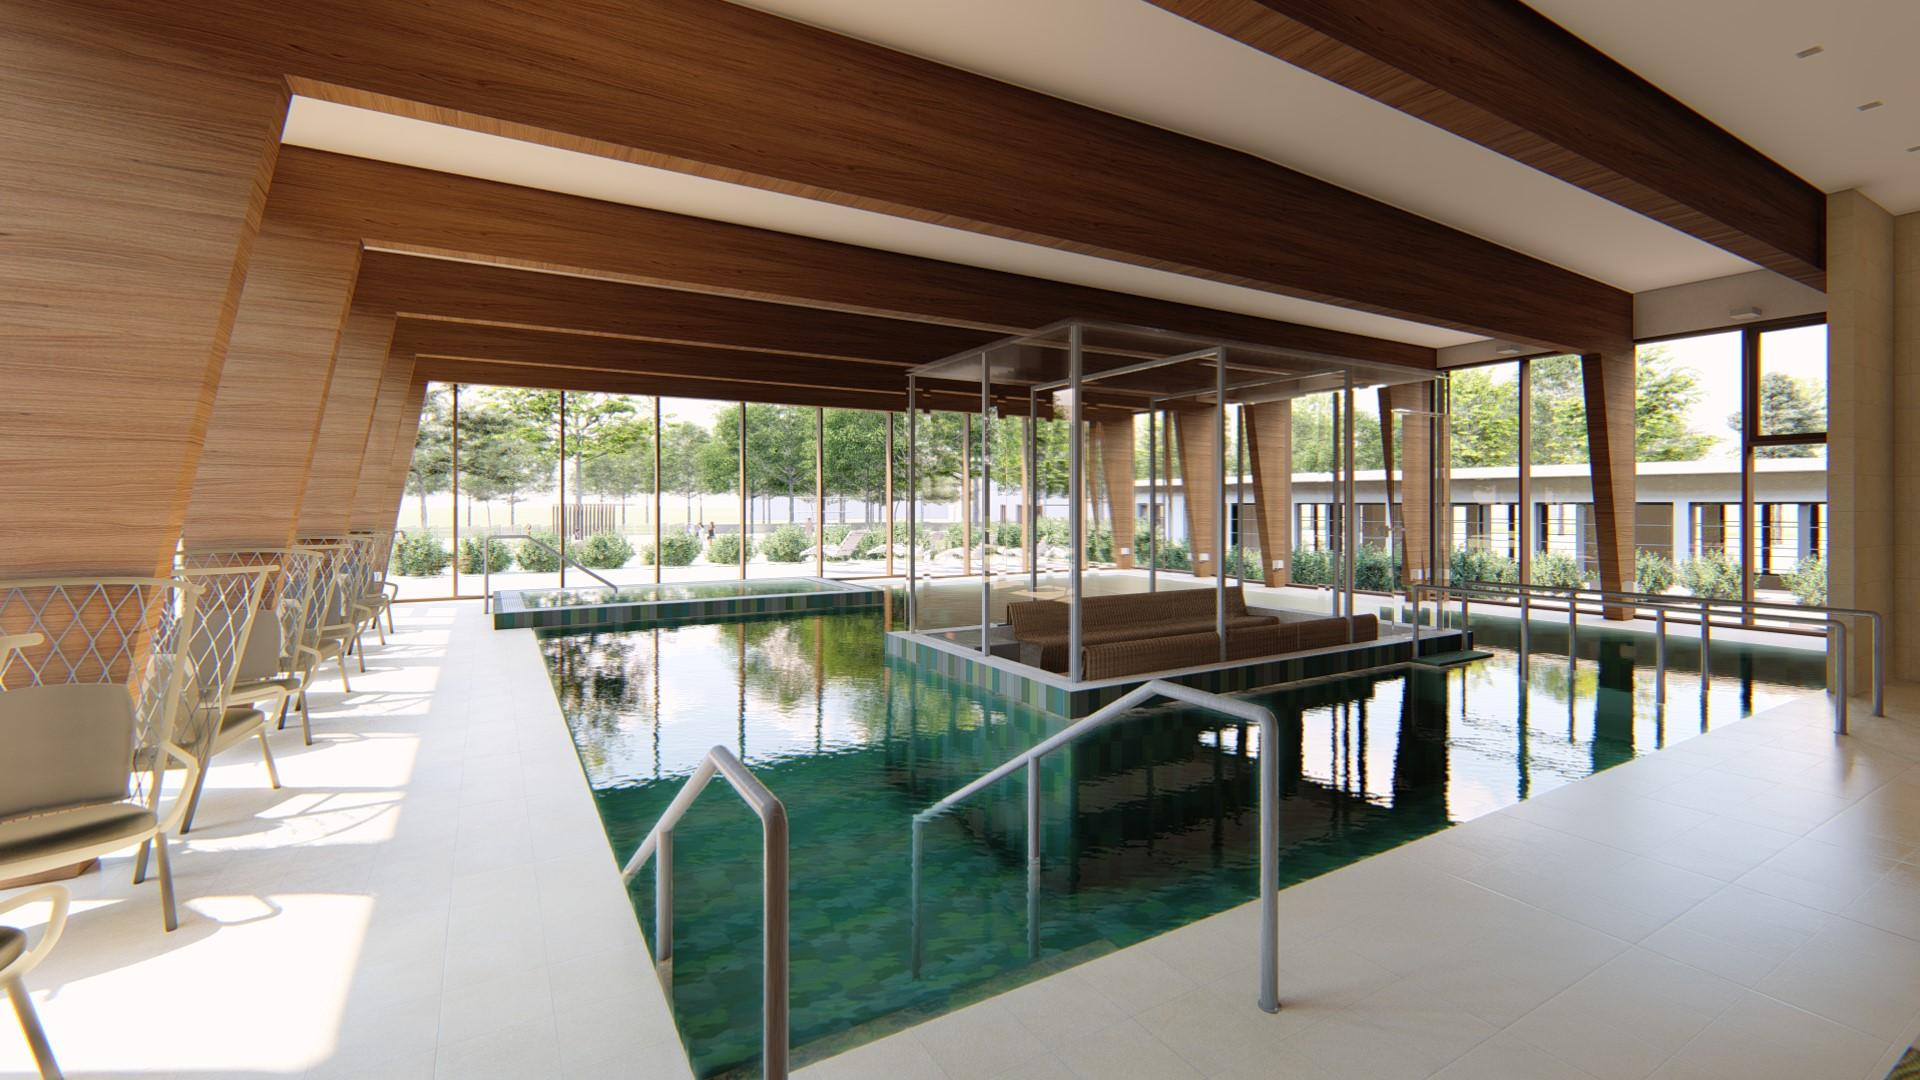 Pärnu kylpylähotelli I Wasa Resort